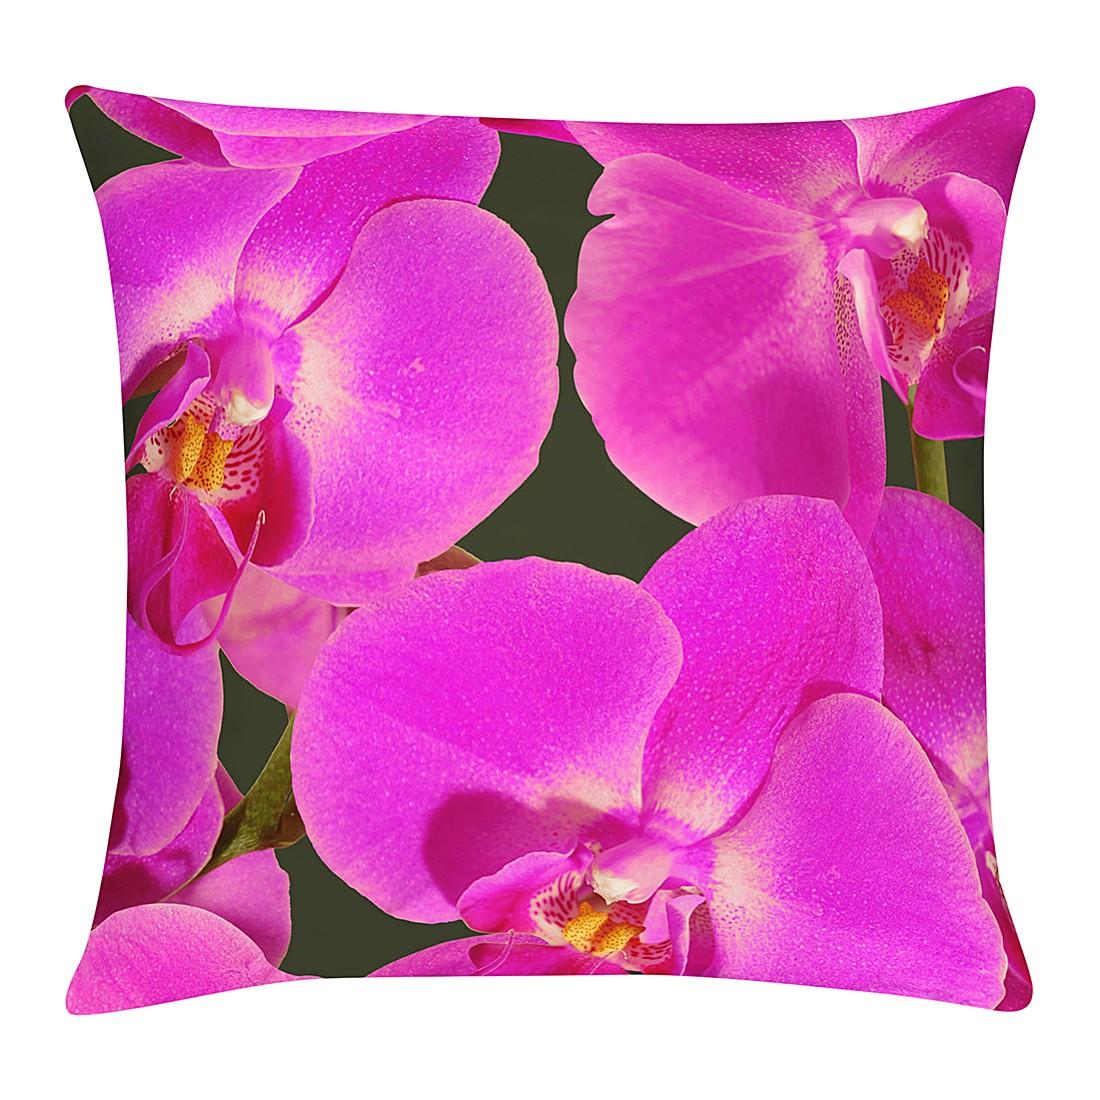 Kussensloop Orchidee - paars - 49x49cm, Apelt